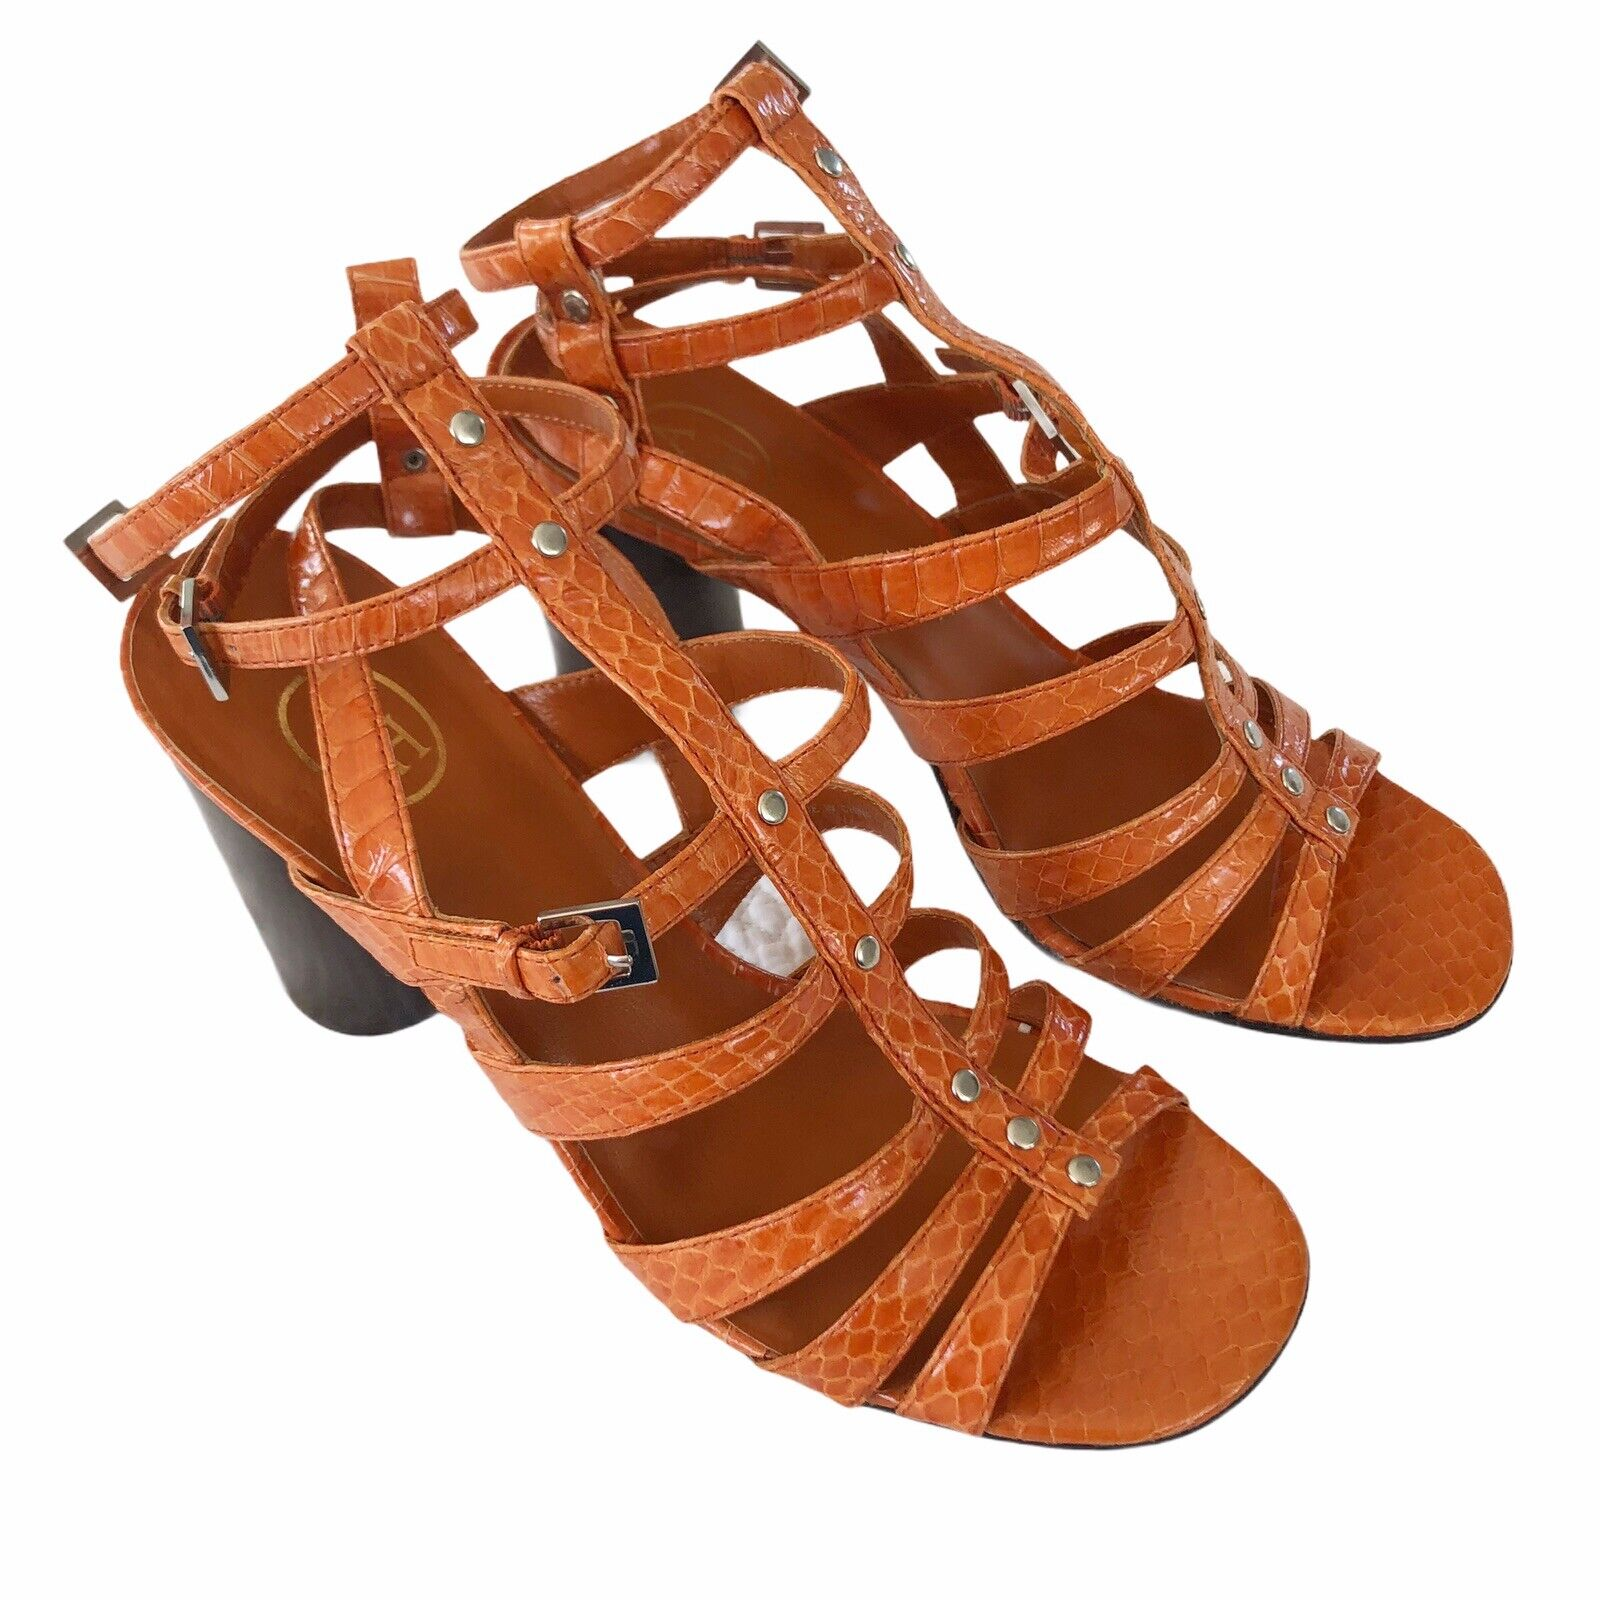 Ash Orange Patterned Leather Caged Strappy High Heel Sandals Size 39 NWOB